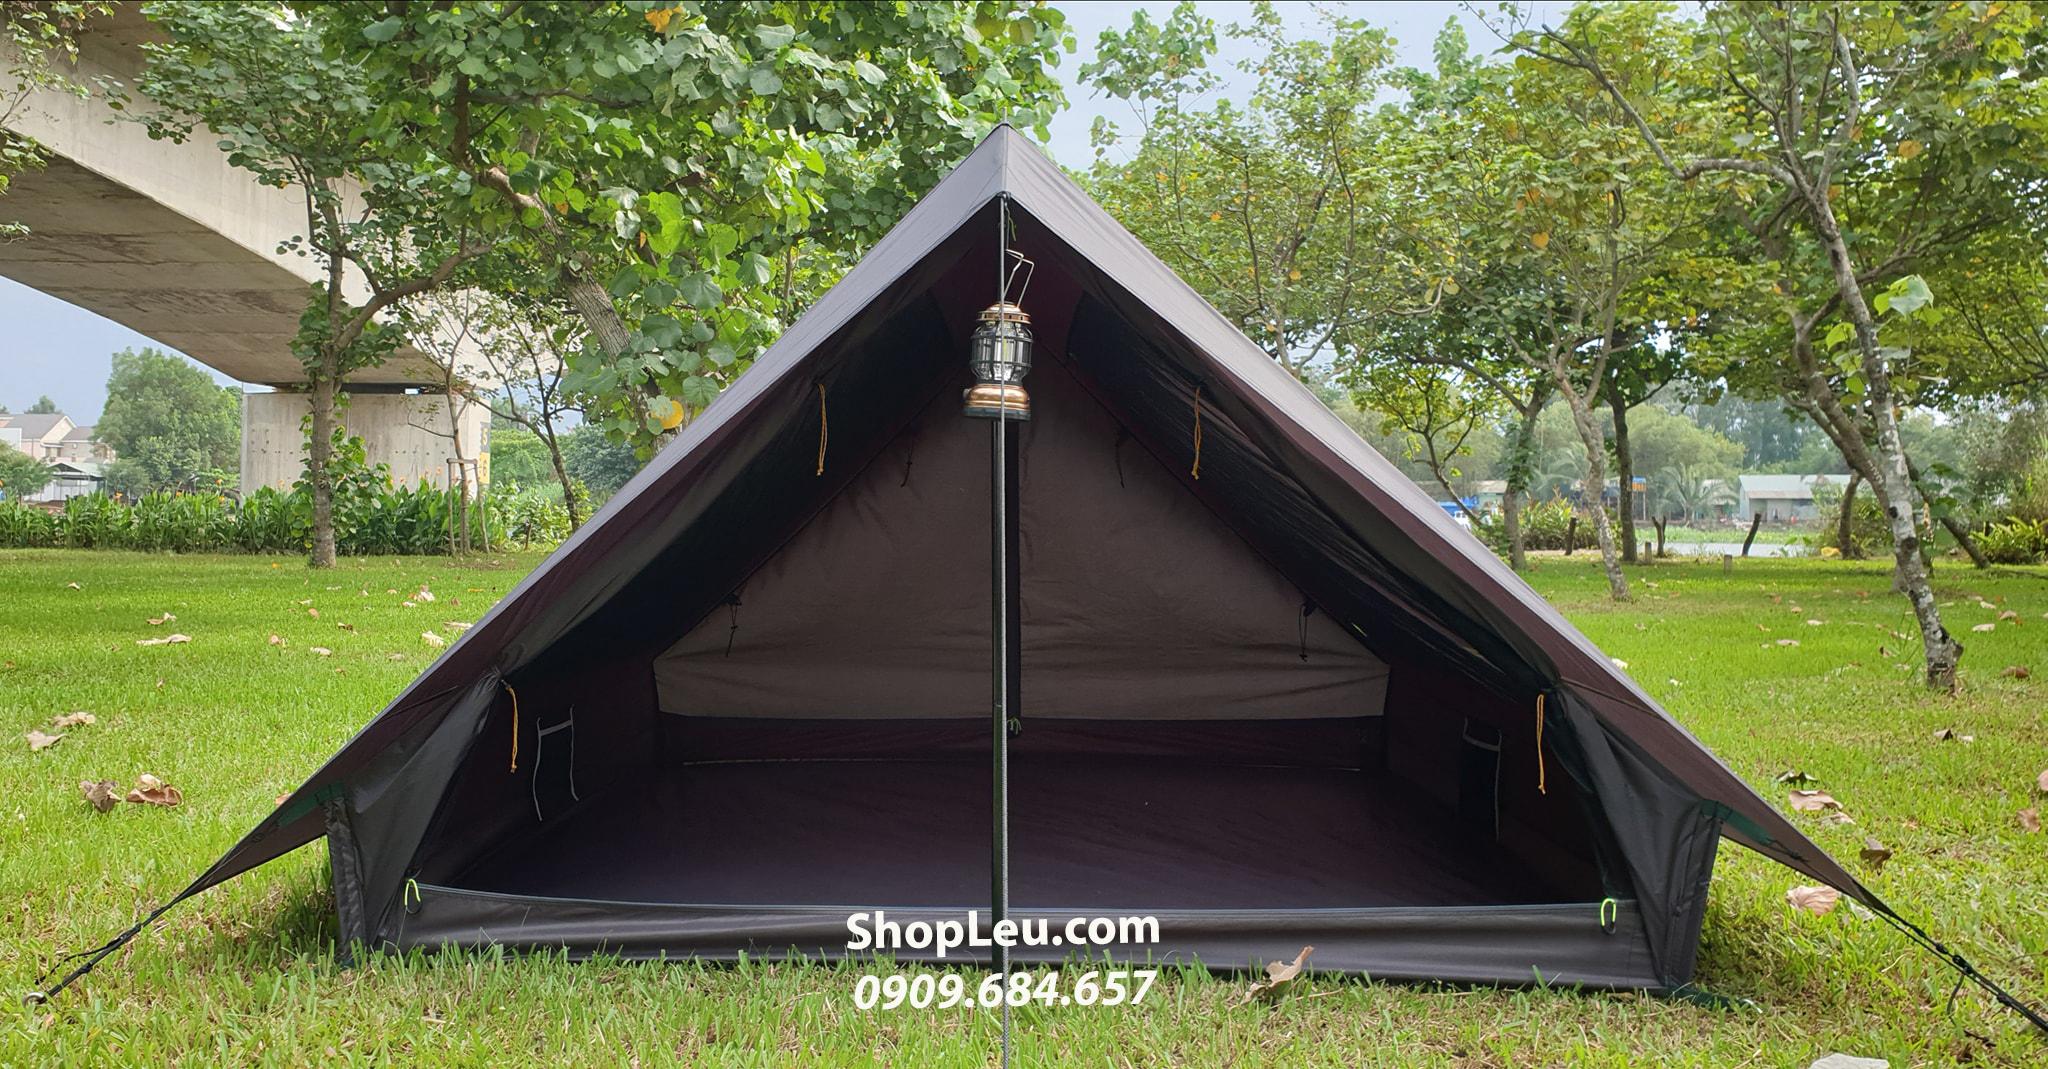 lều vintage home 4 - 5p xám